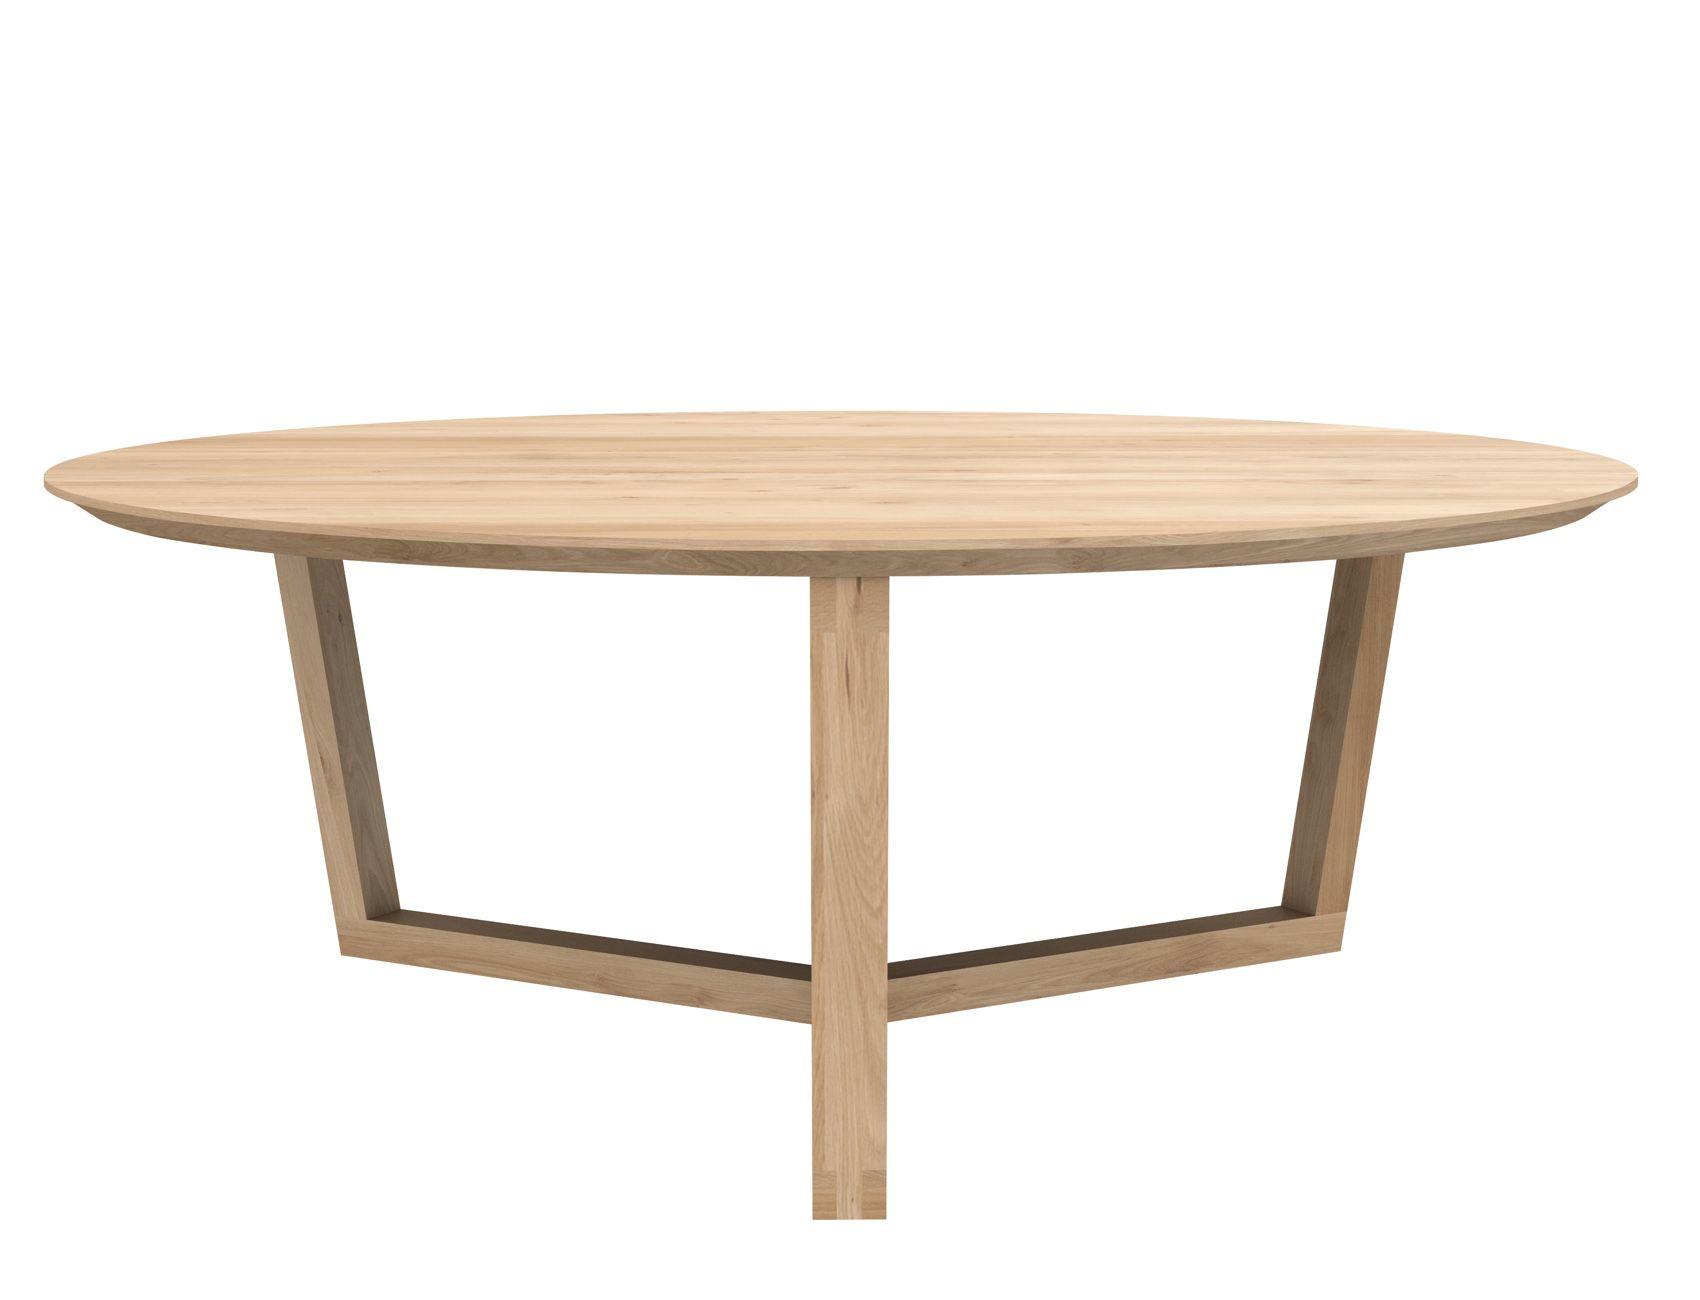 Ethnicraft Tripod Coffee Table